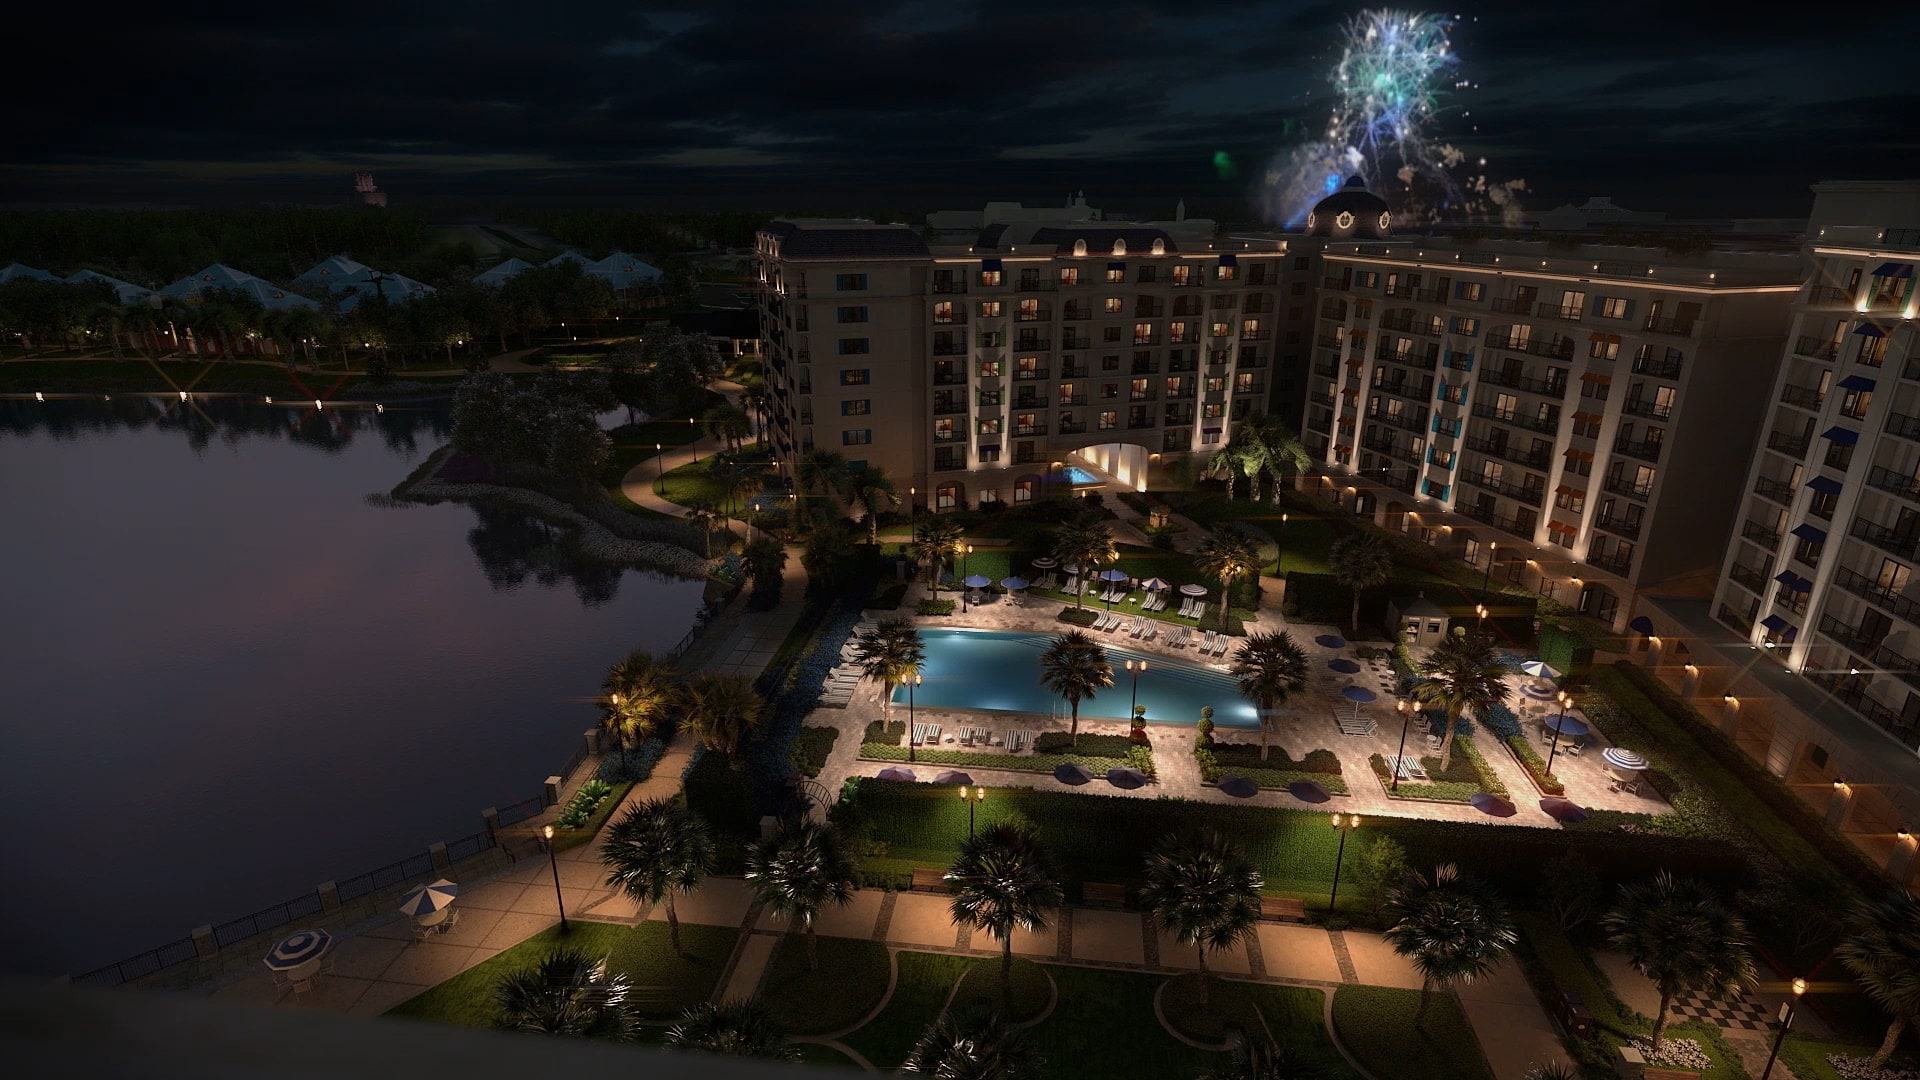 Fireworks bursting in the night sky above Disney's Riviera Resort